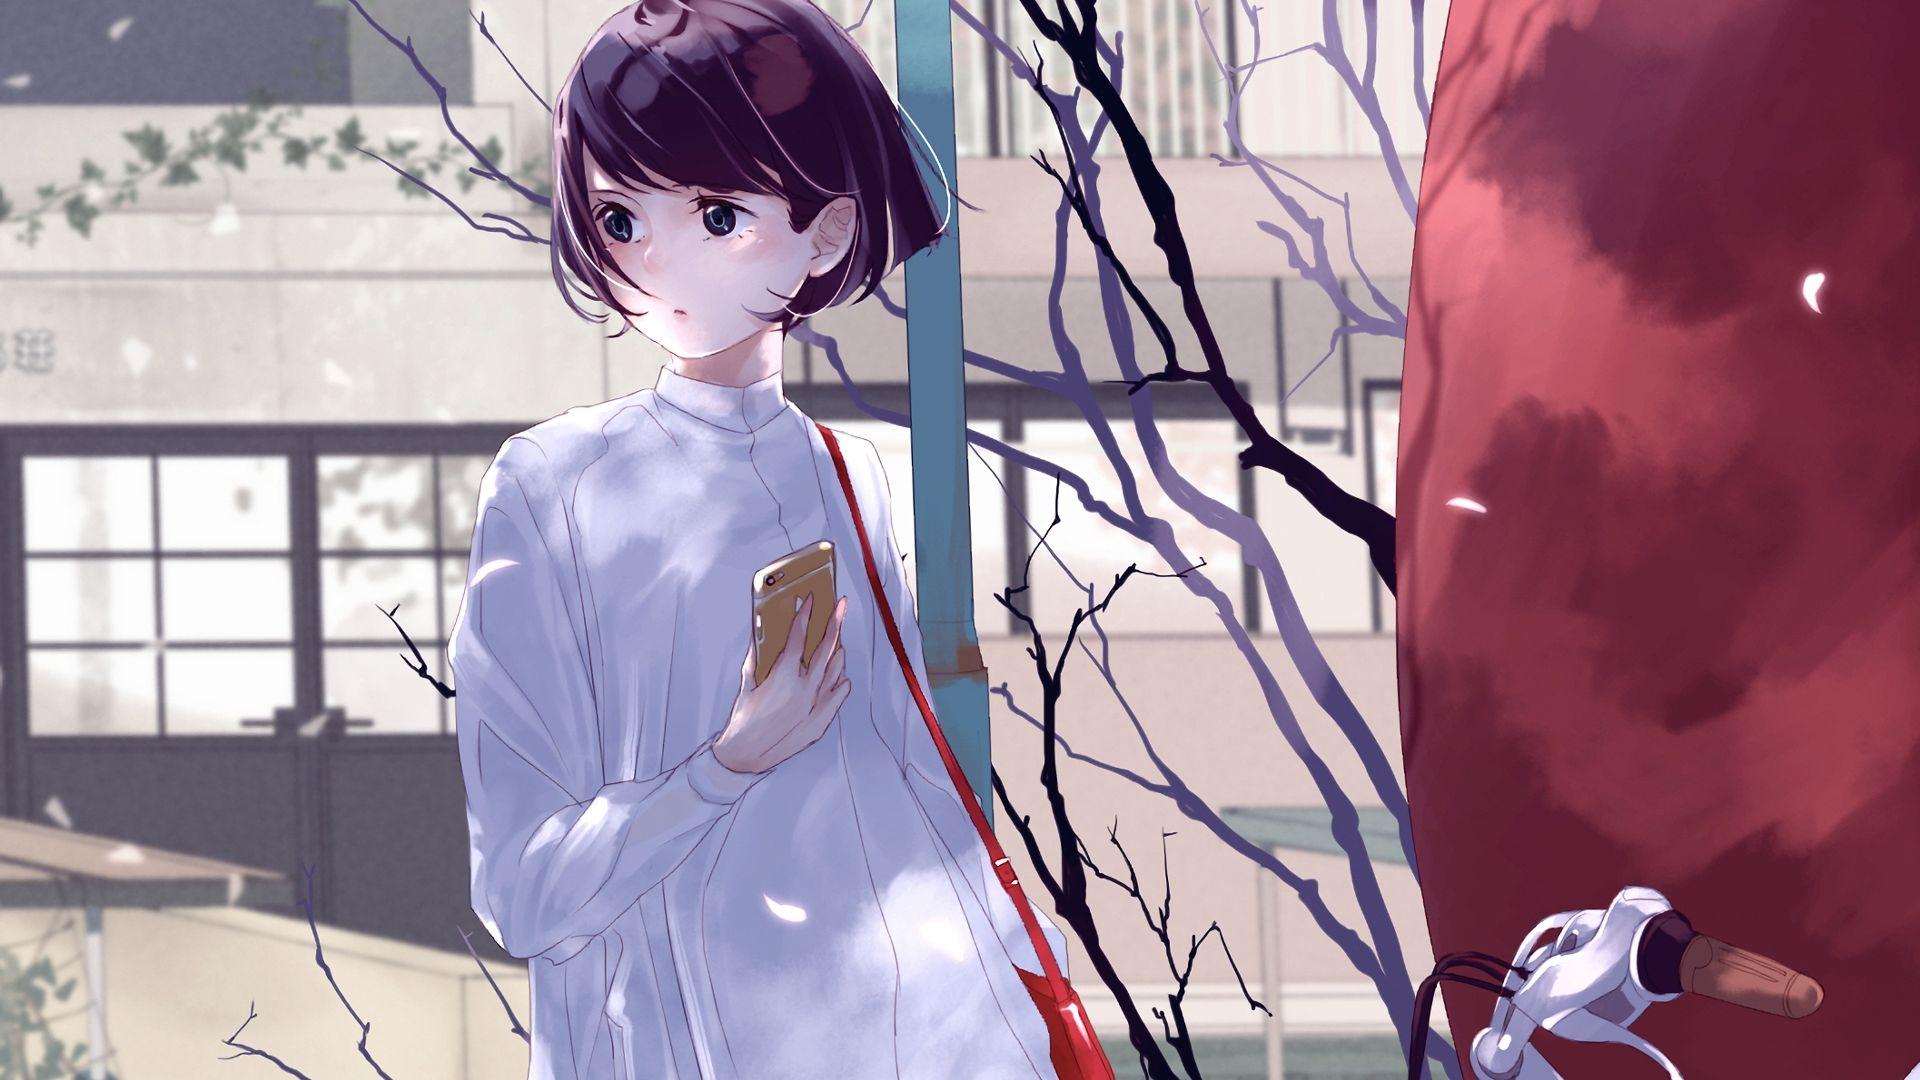 Cute Anime Girl Wallpaper Phone Hd Anime Wallpapers